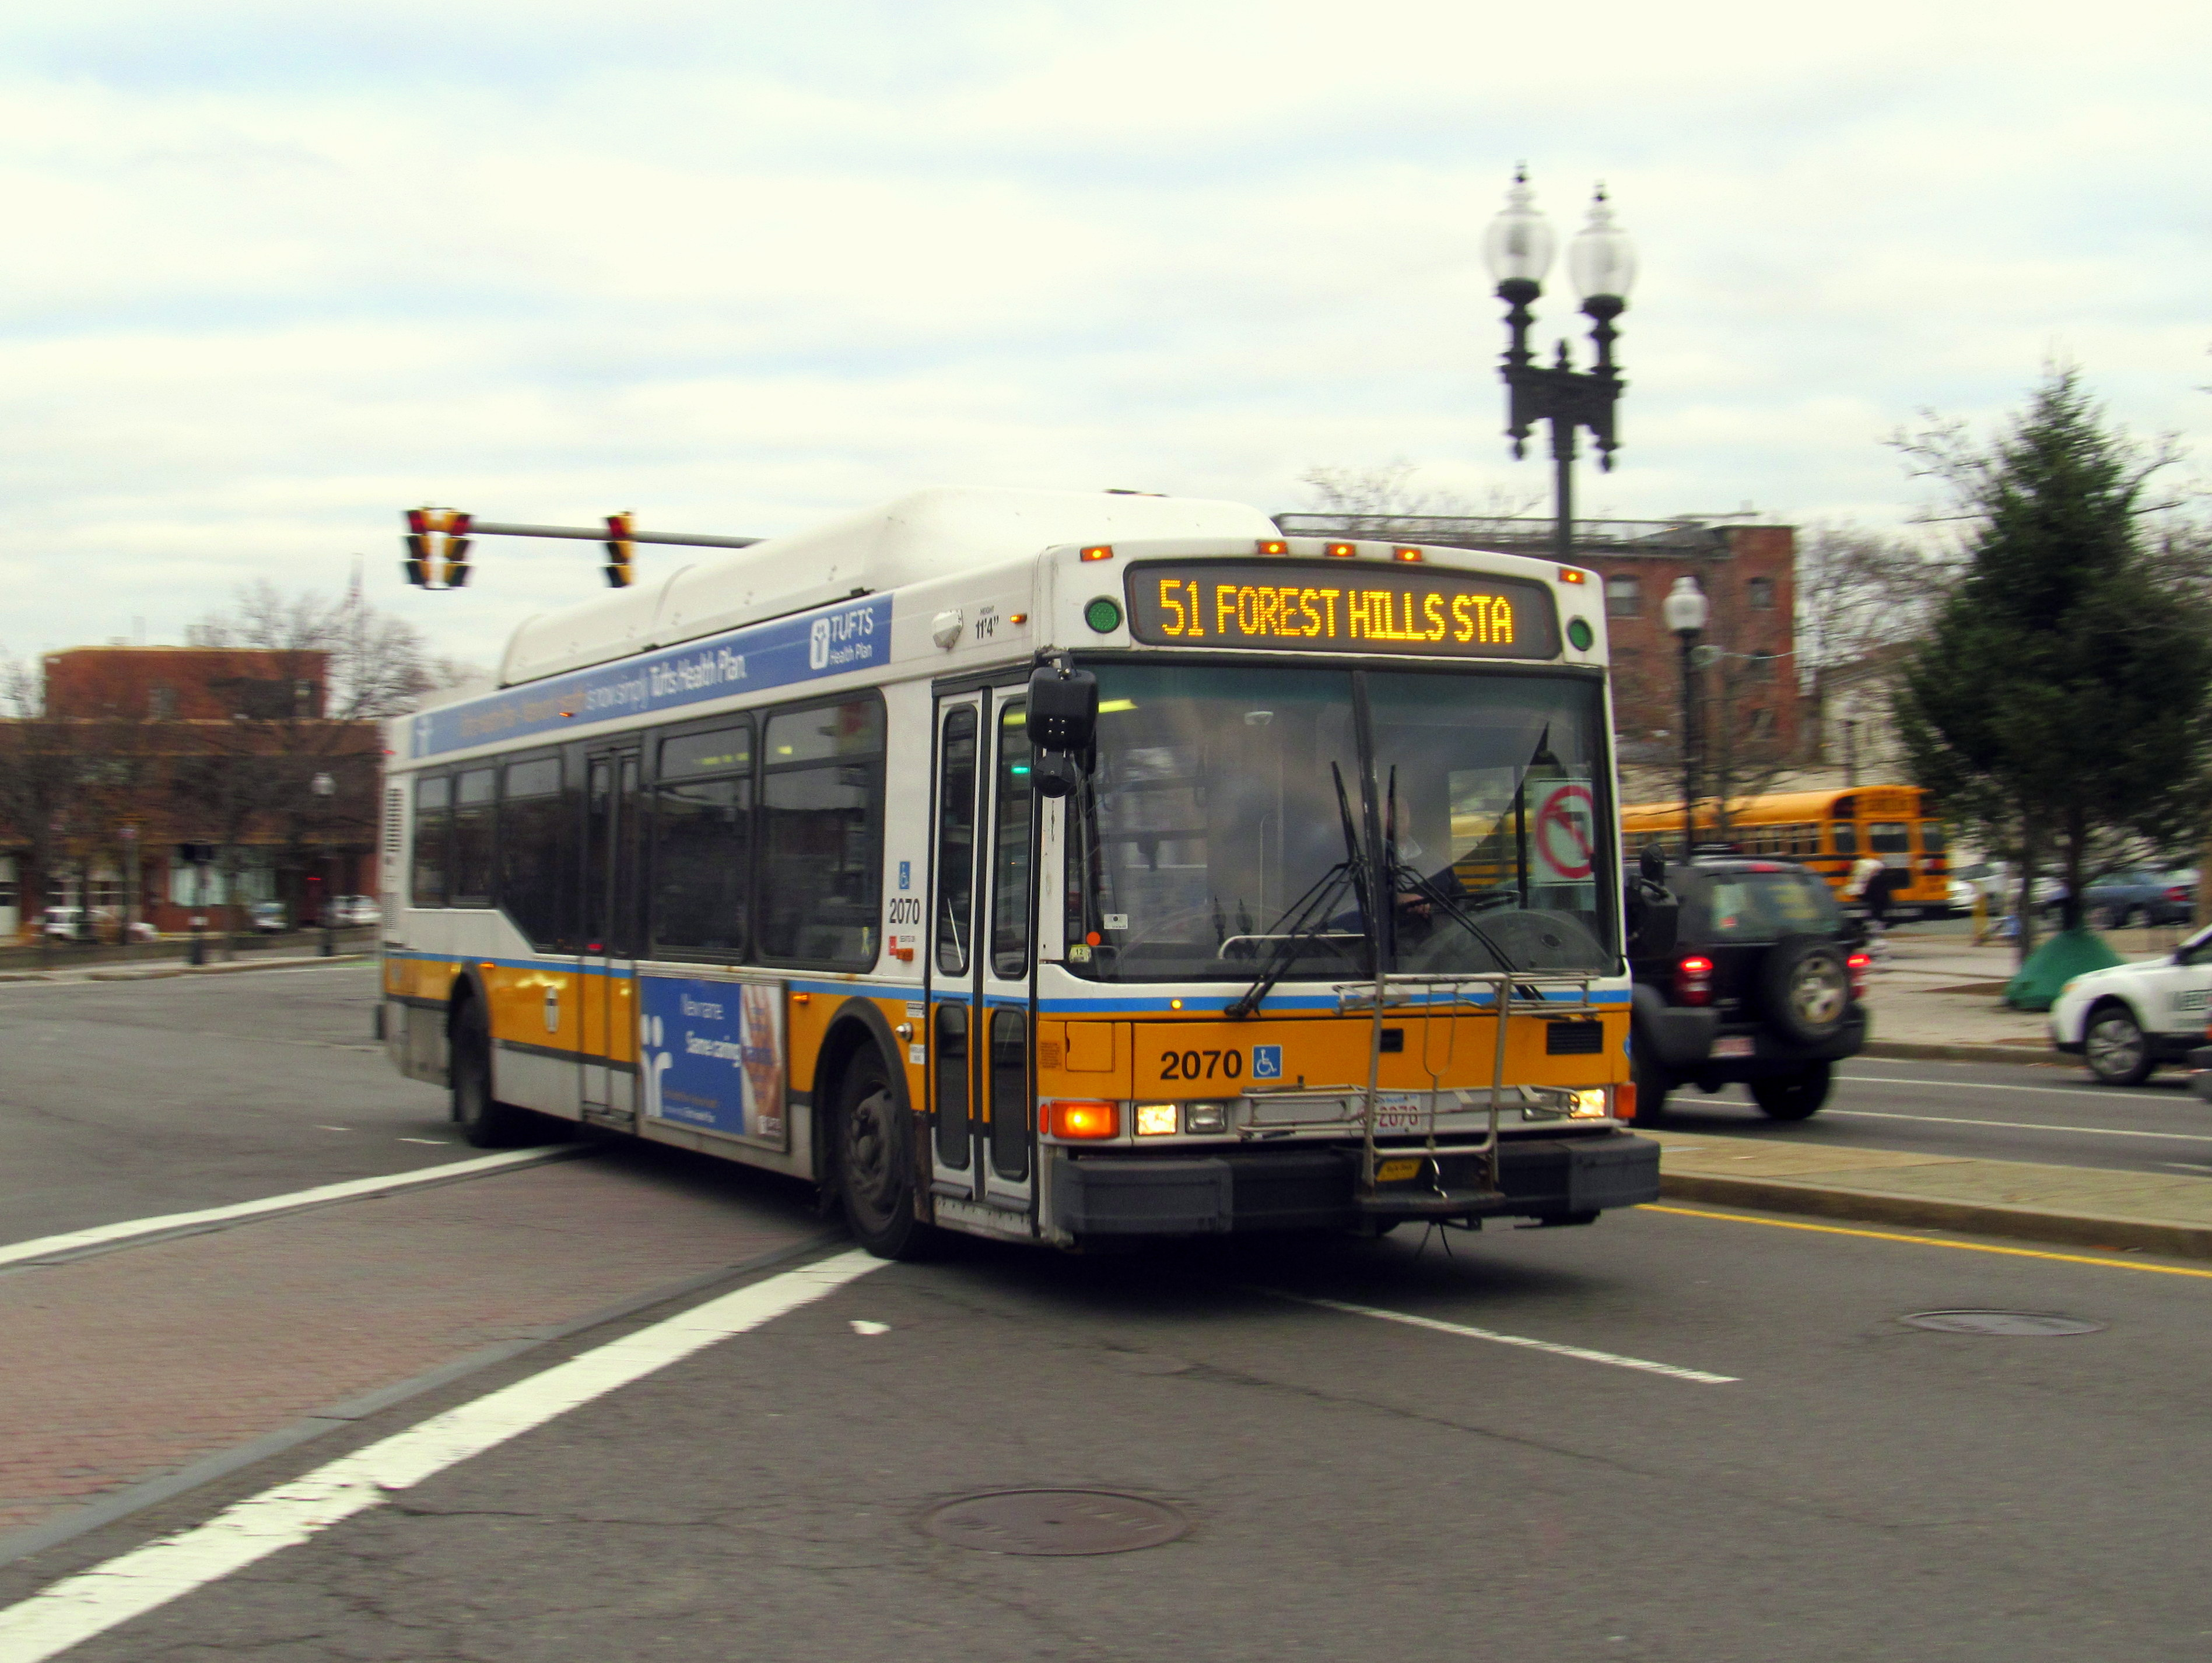 File Mbta Route 51 Bus At Union Square November 2015 Jpg